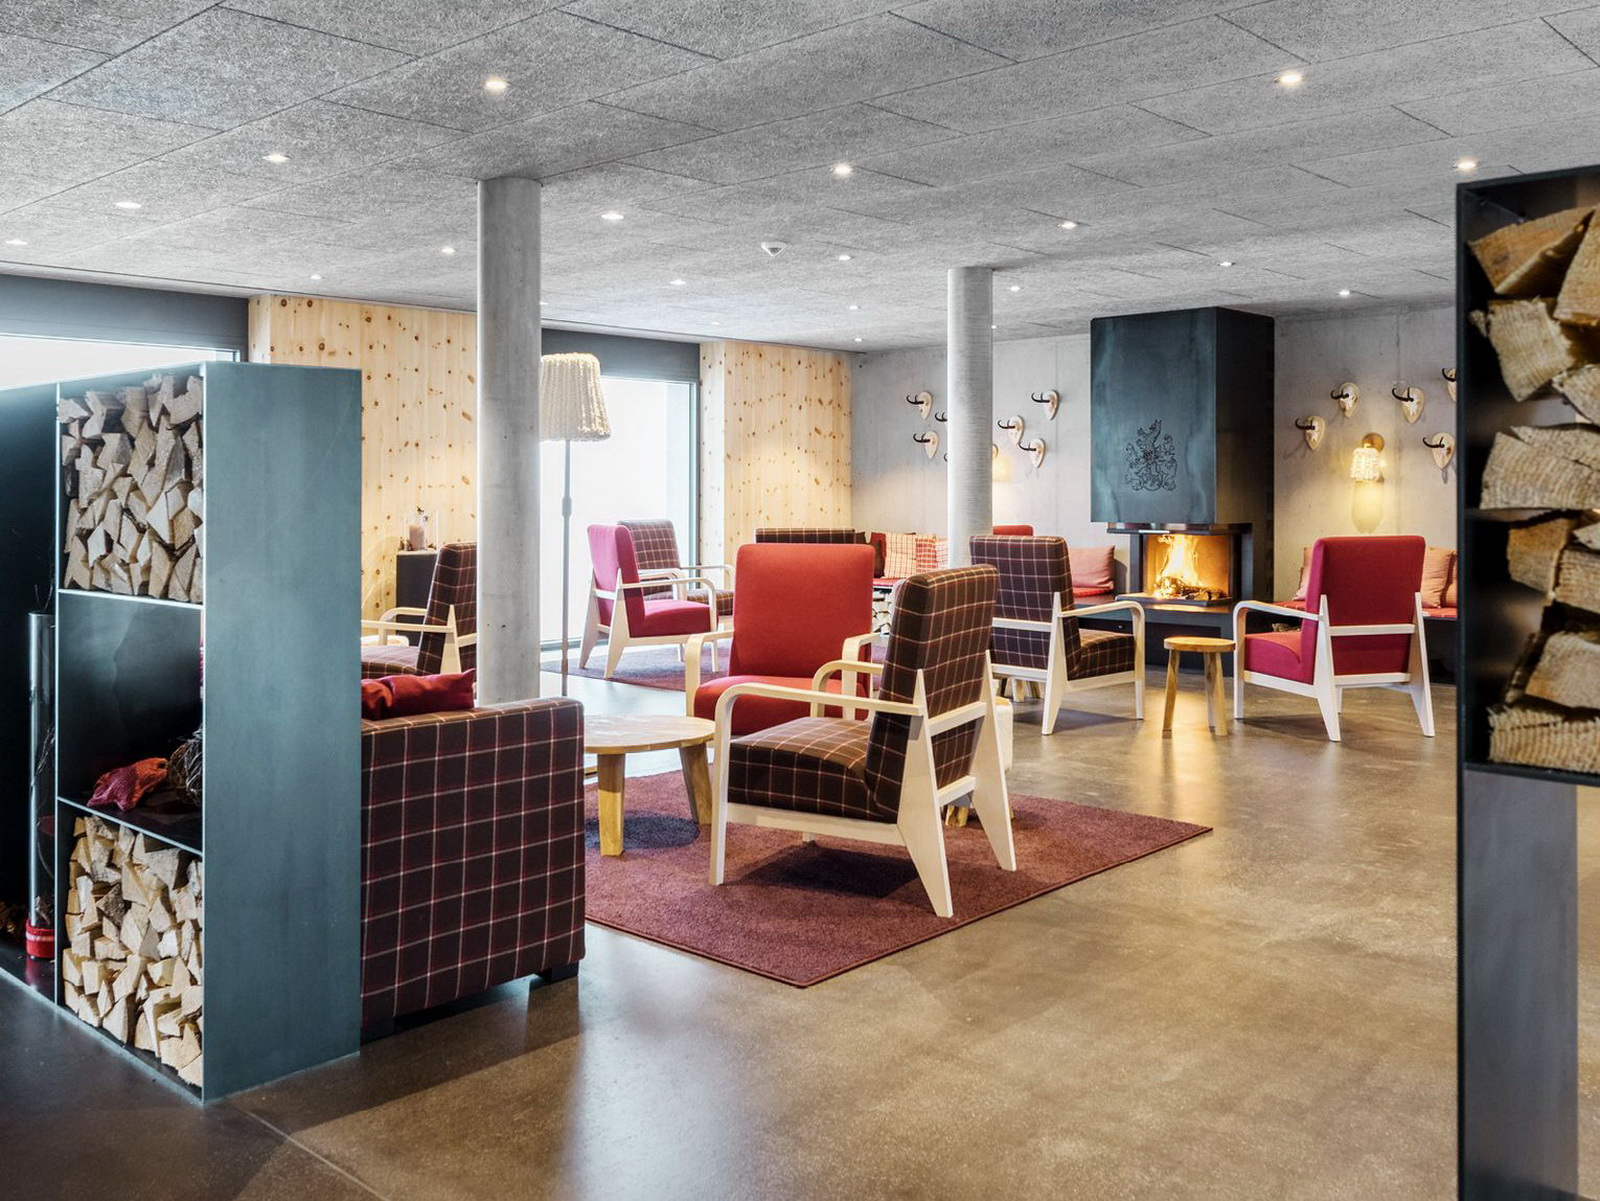 Aufenthaltsraum des Bergseetauch Hotel Mettmenalp